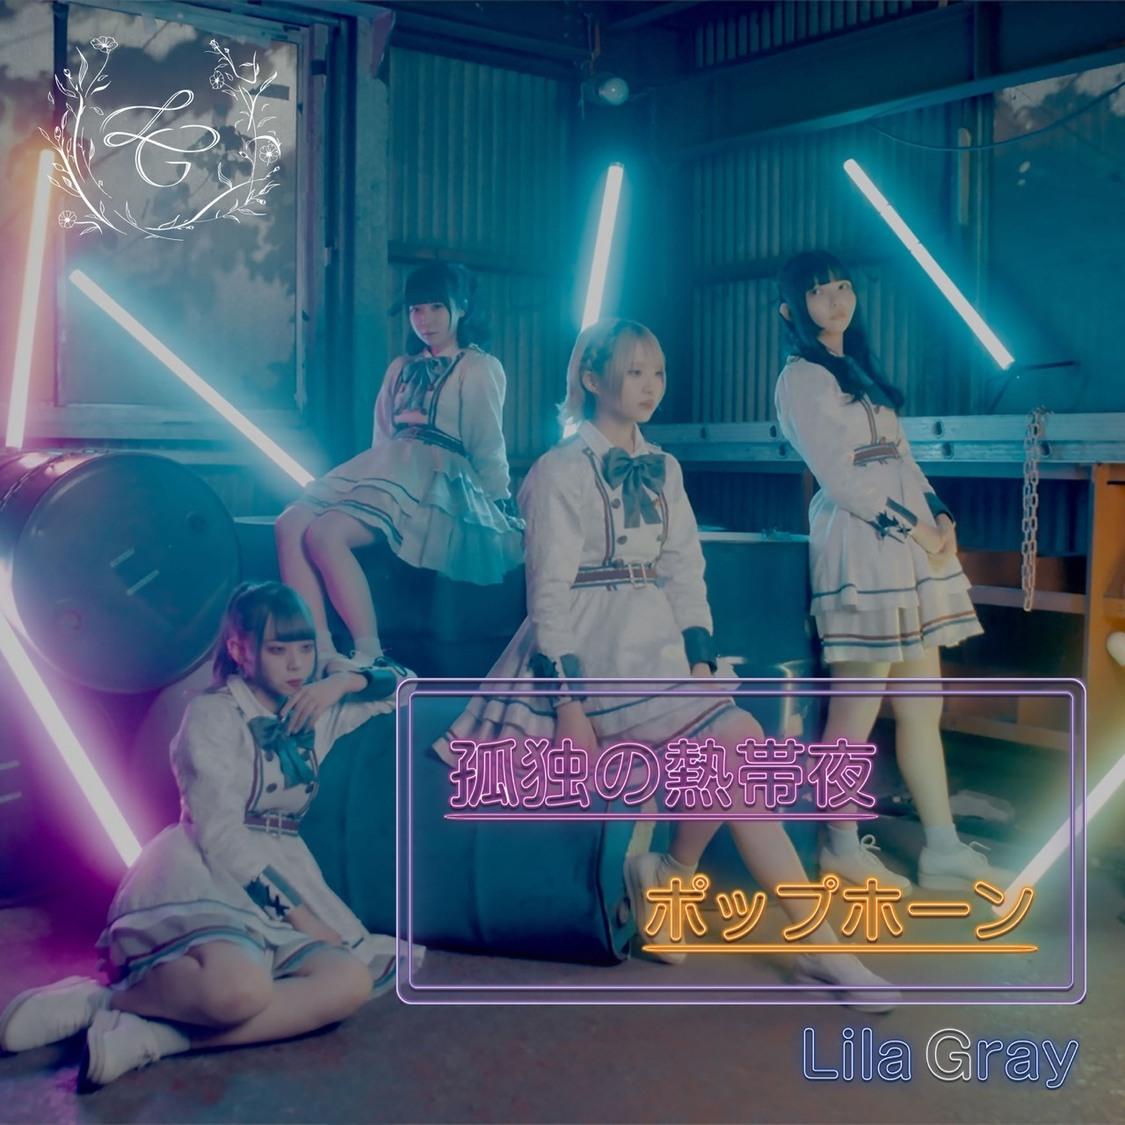 1stシングル「孤独の熱帯夜/ポップホーン」